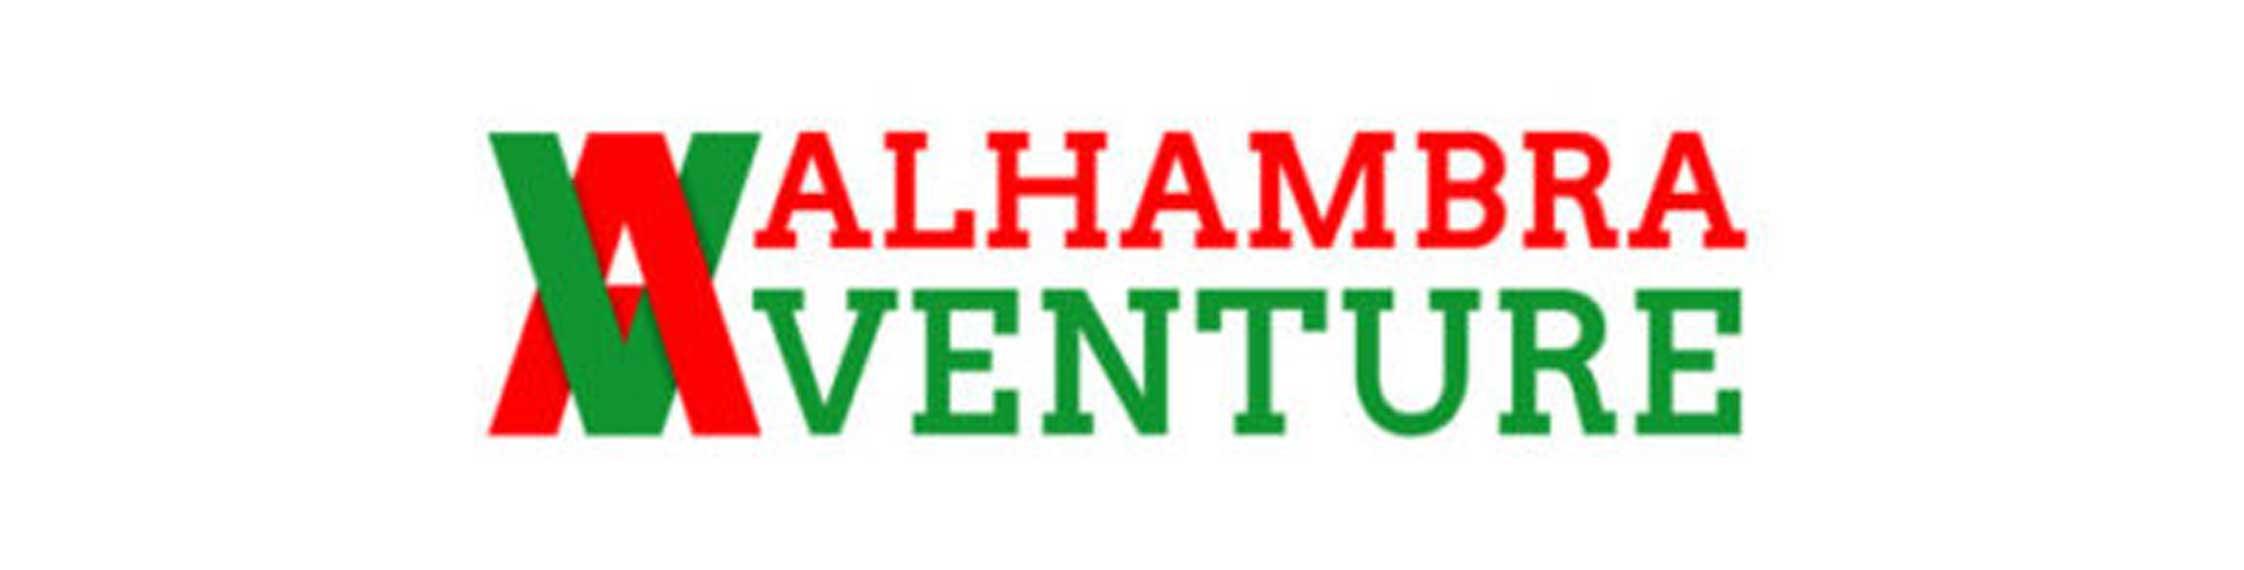 alhambra-venture